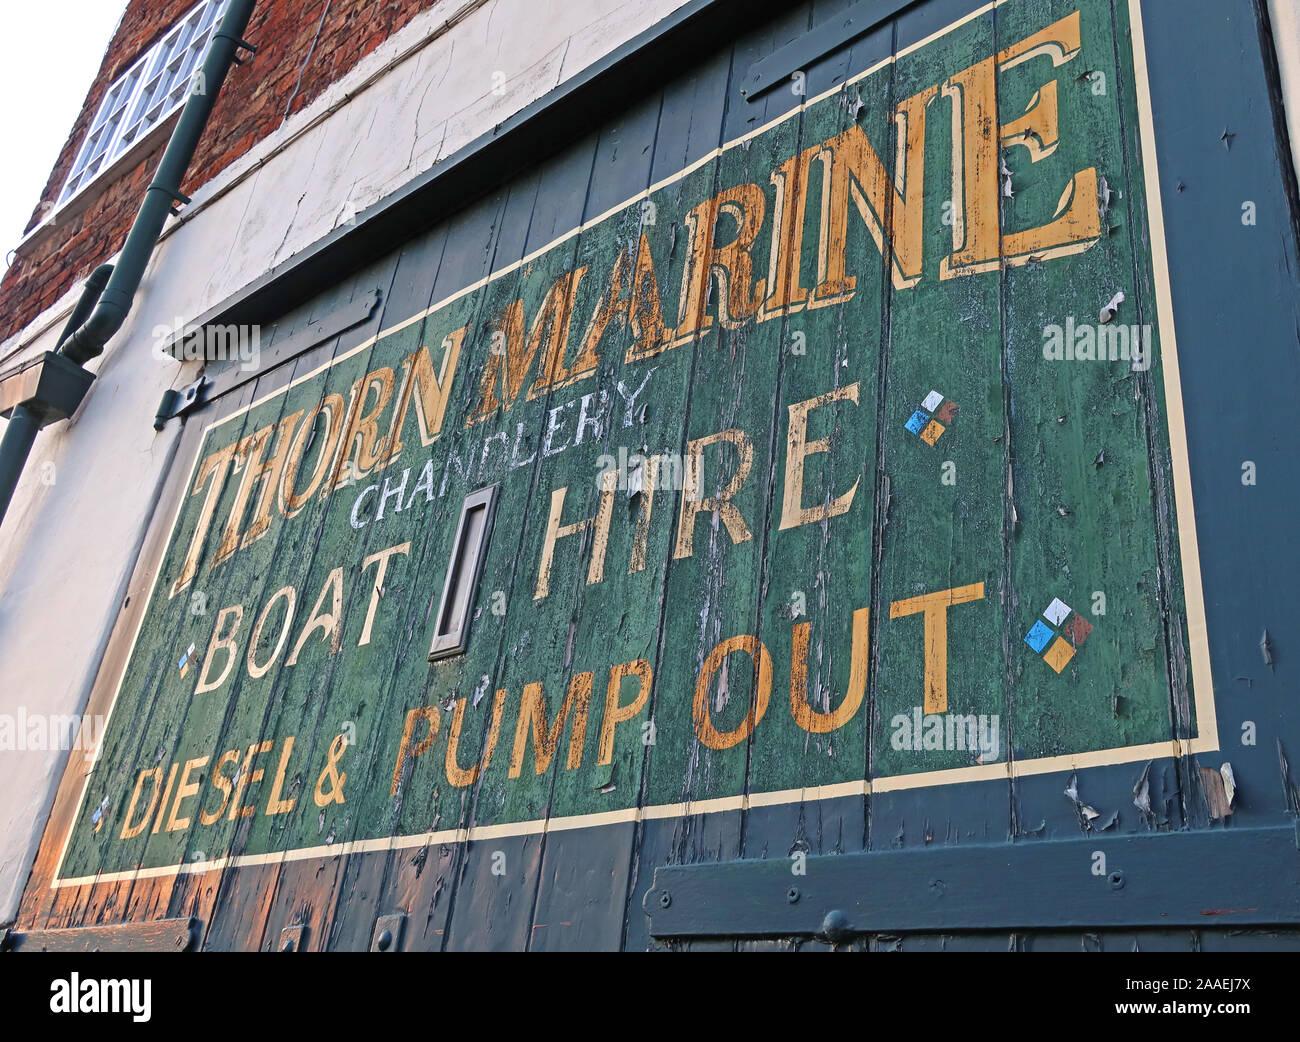 Dieses Stockfoto: Thorn Marine Chandlery Bootsverleih, Dieselpumpe, Bridgewater Canal, Stockton Heide, Warrington, Cheshire, England, UK, WA4 6LE - 2AAEJ7